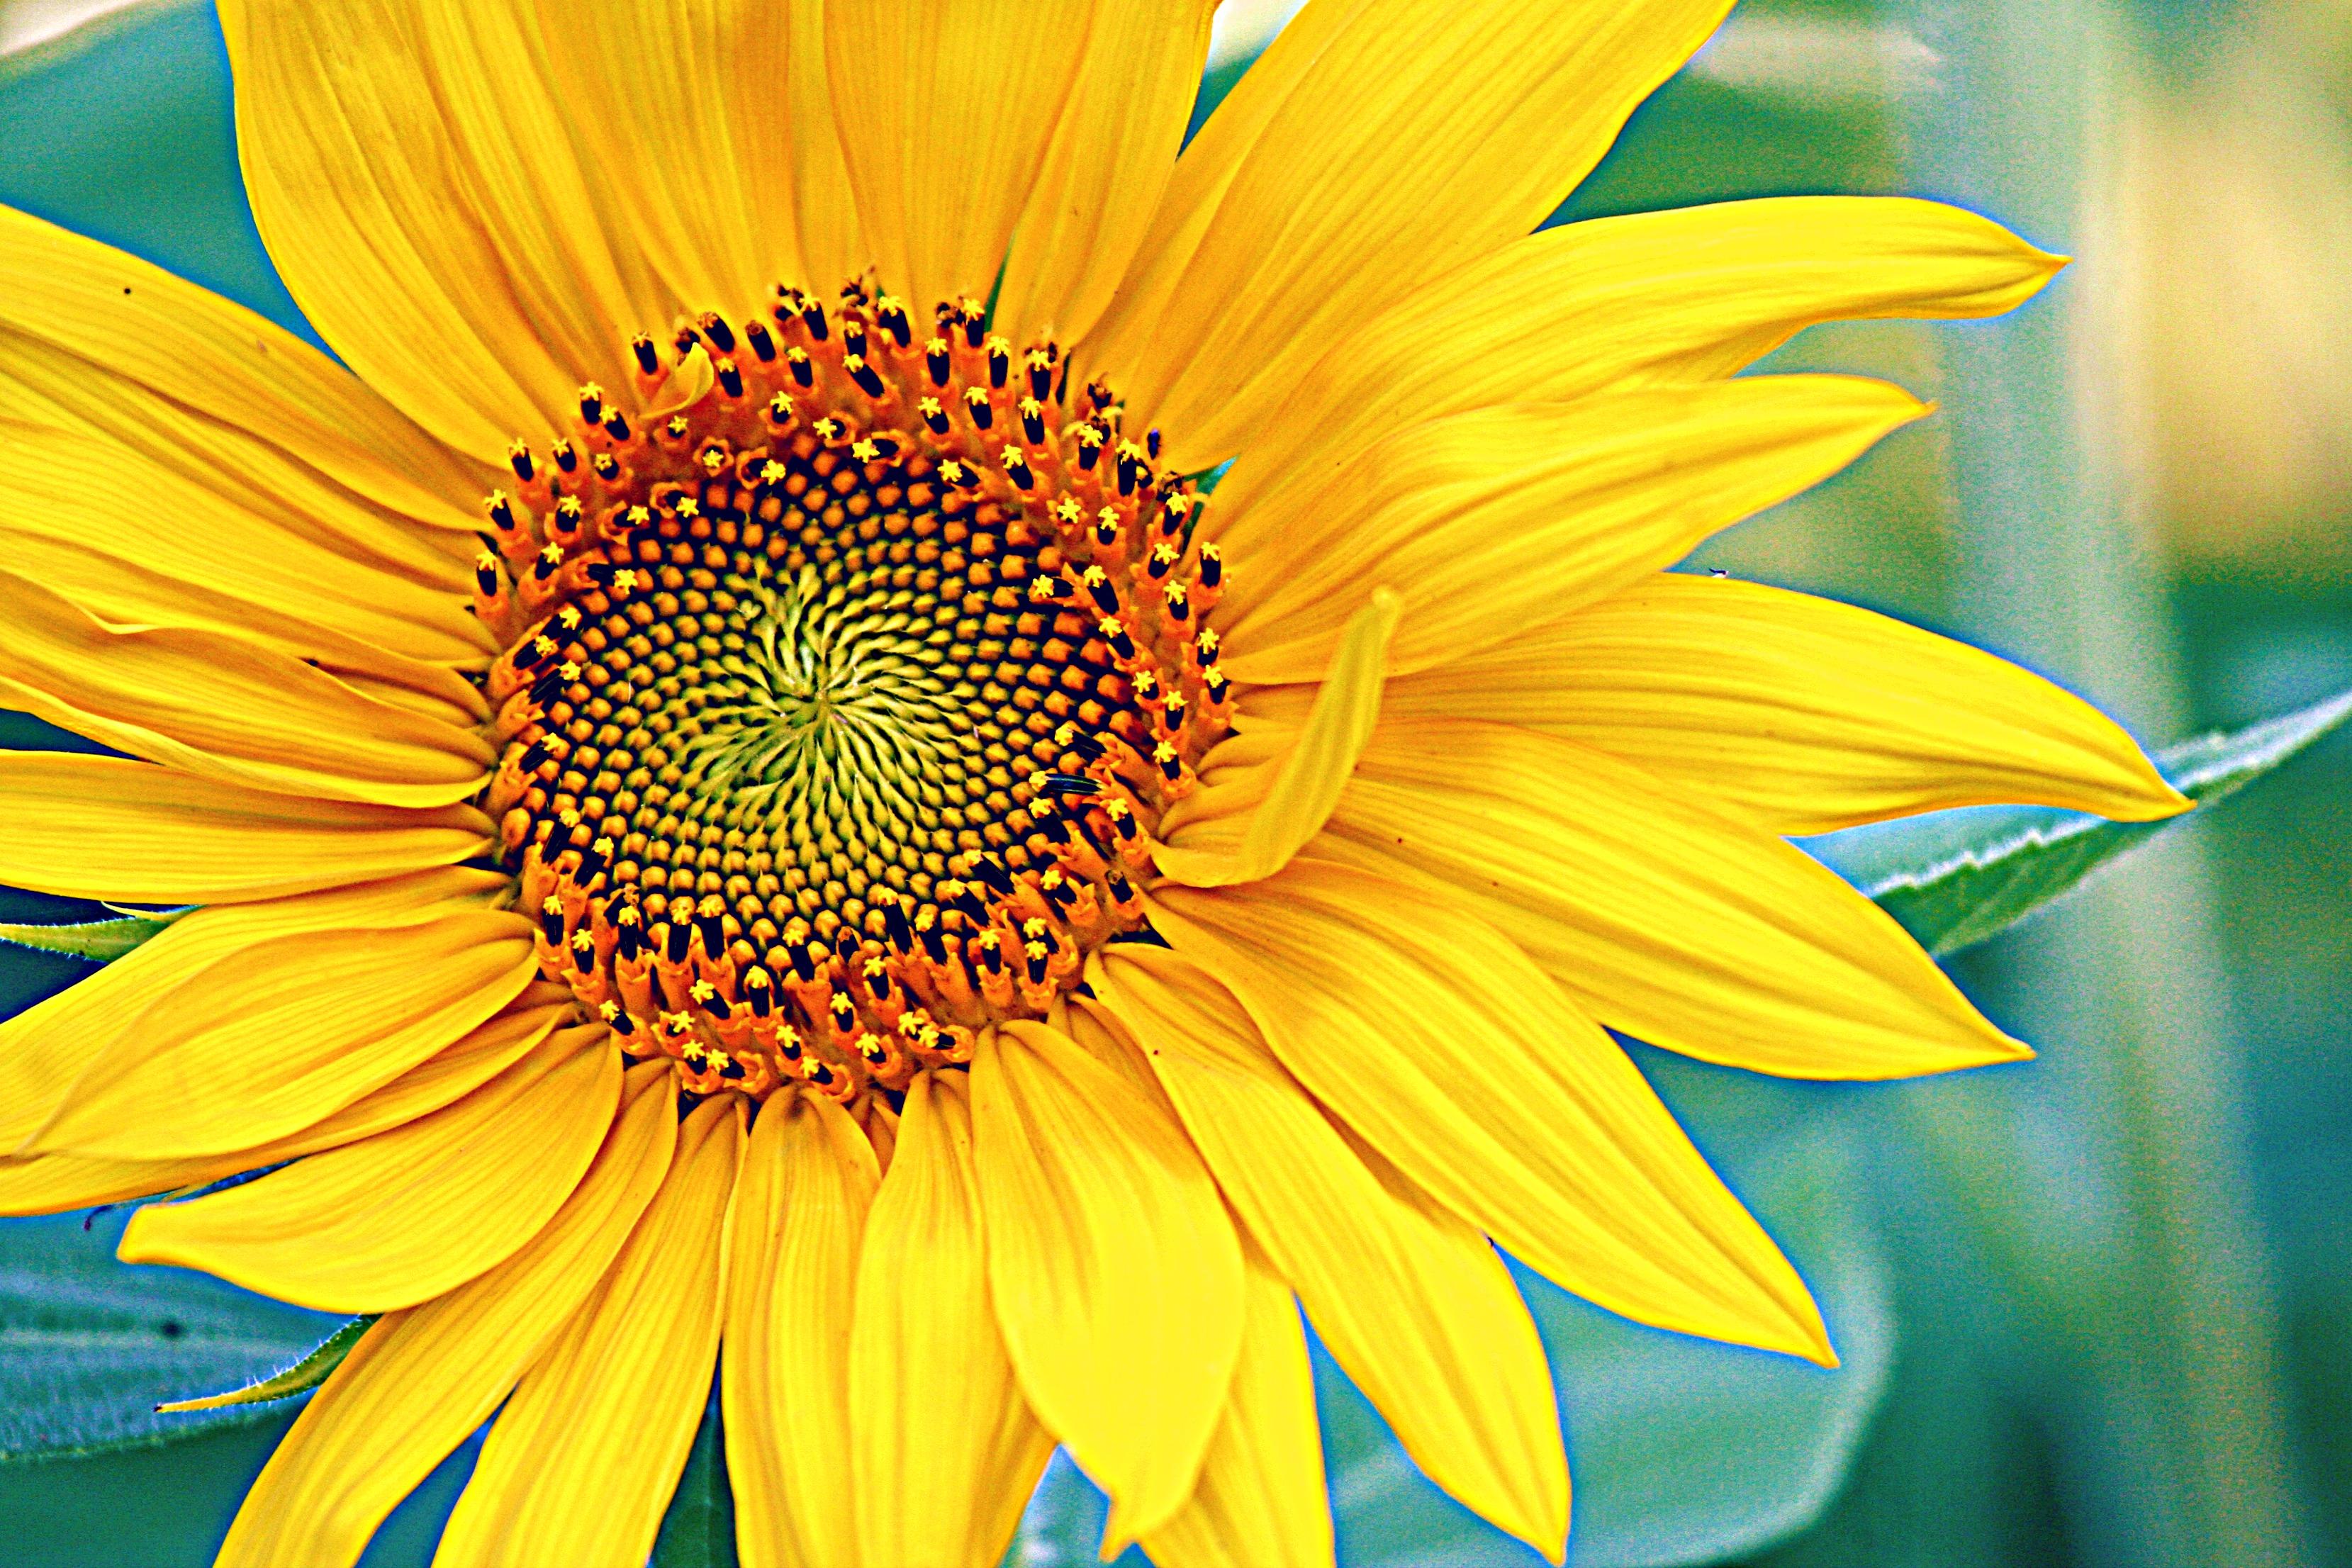 August sunflowers fire